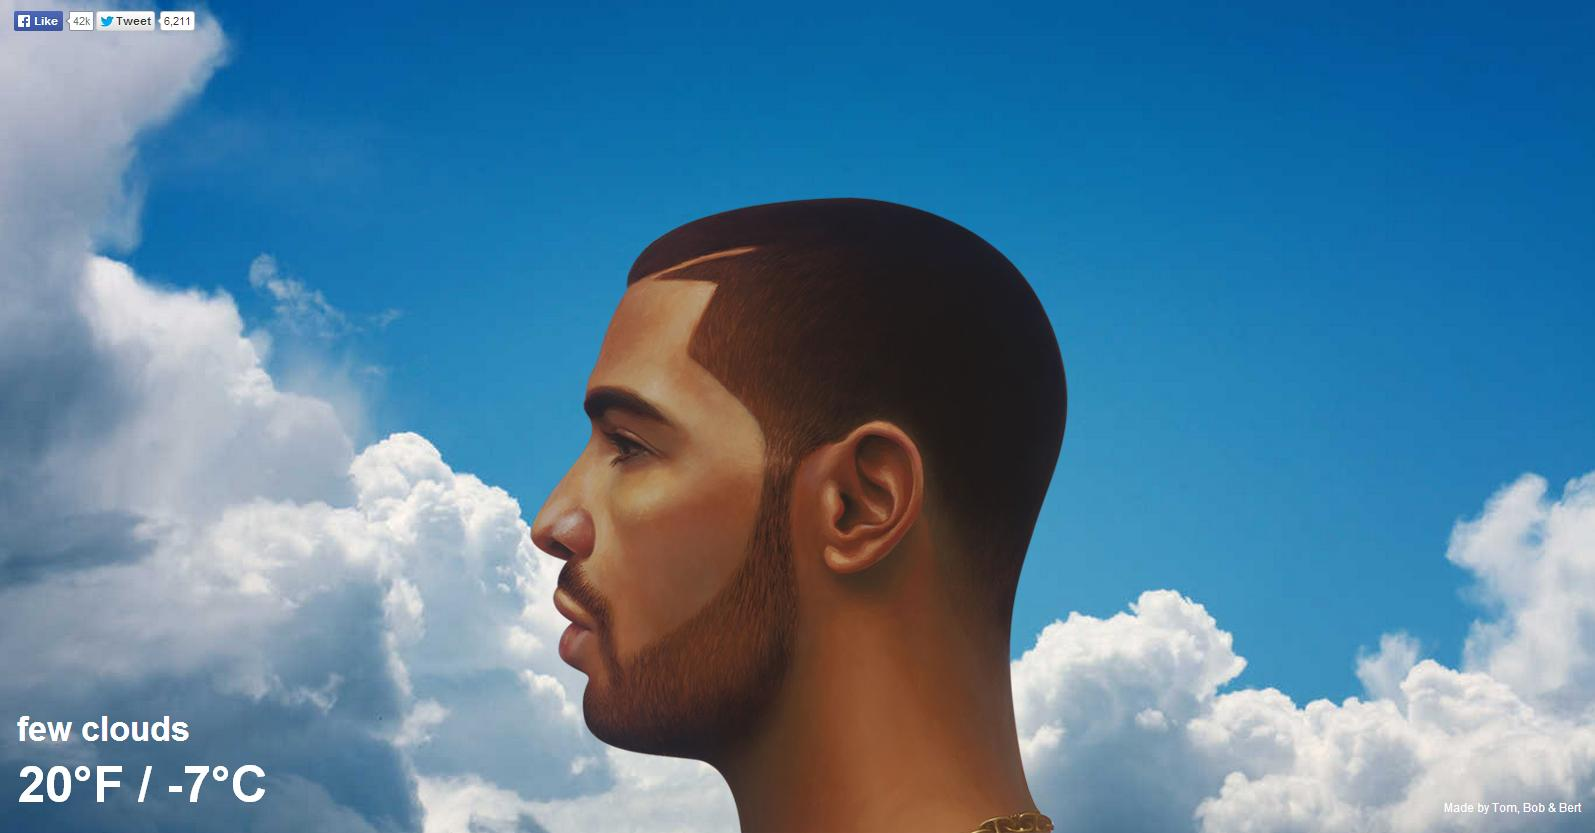 Drakeweather